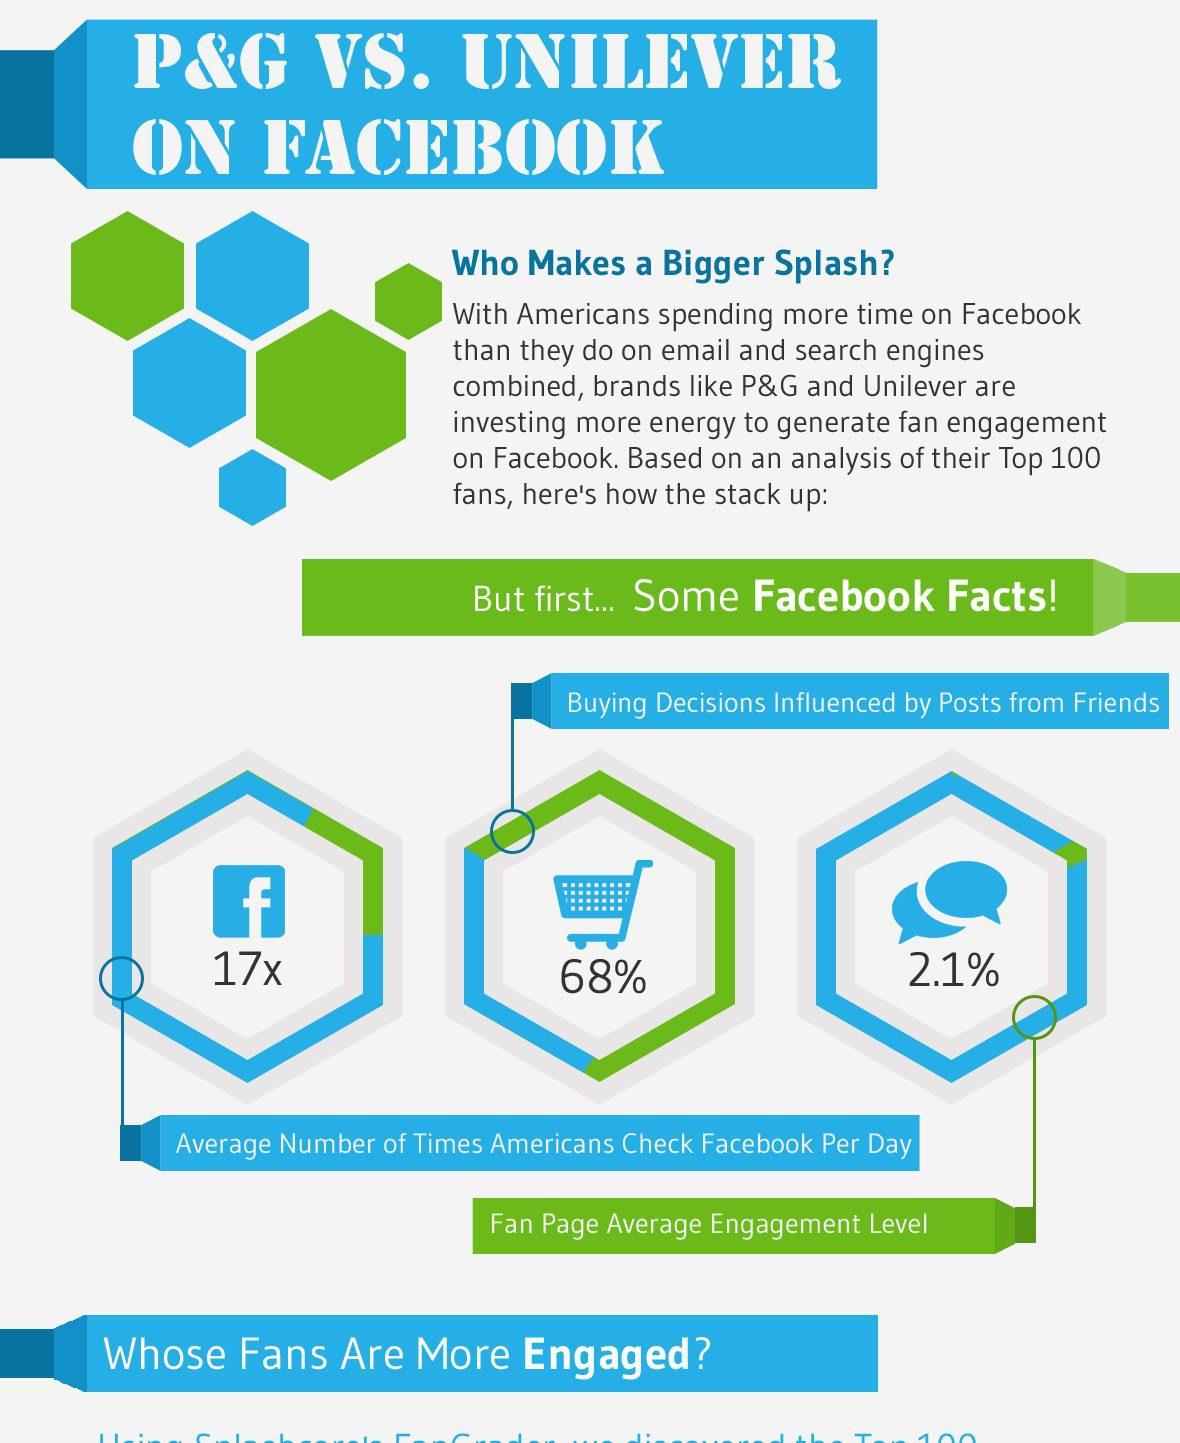 [INFOGRAPHIC] – P&G VS. Unilever on Facebook